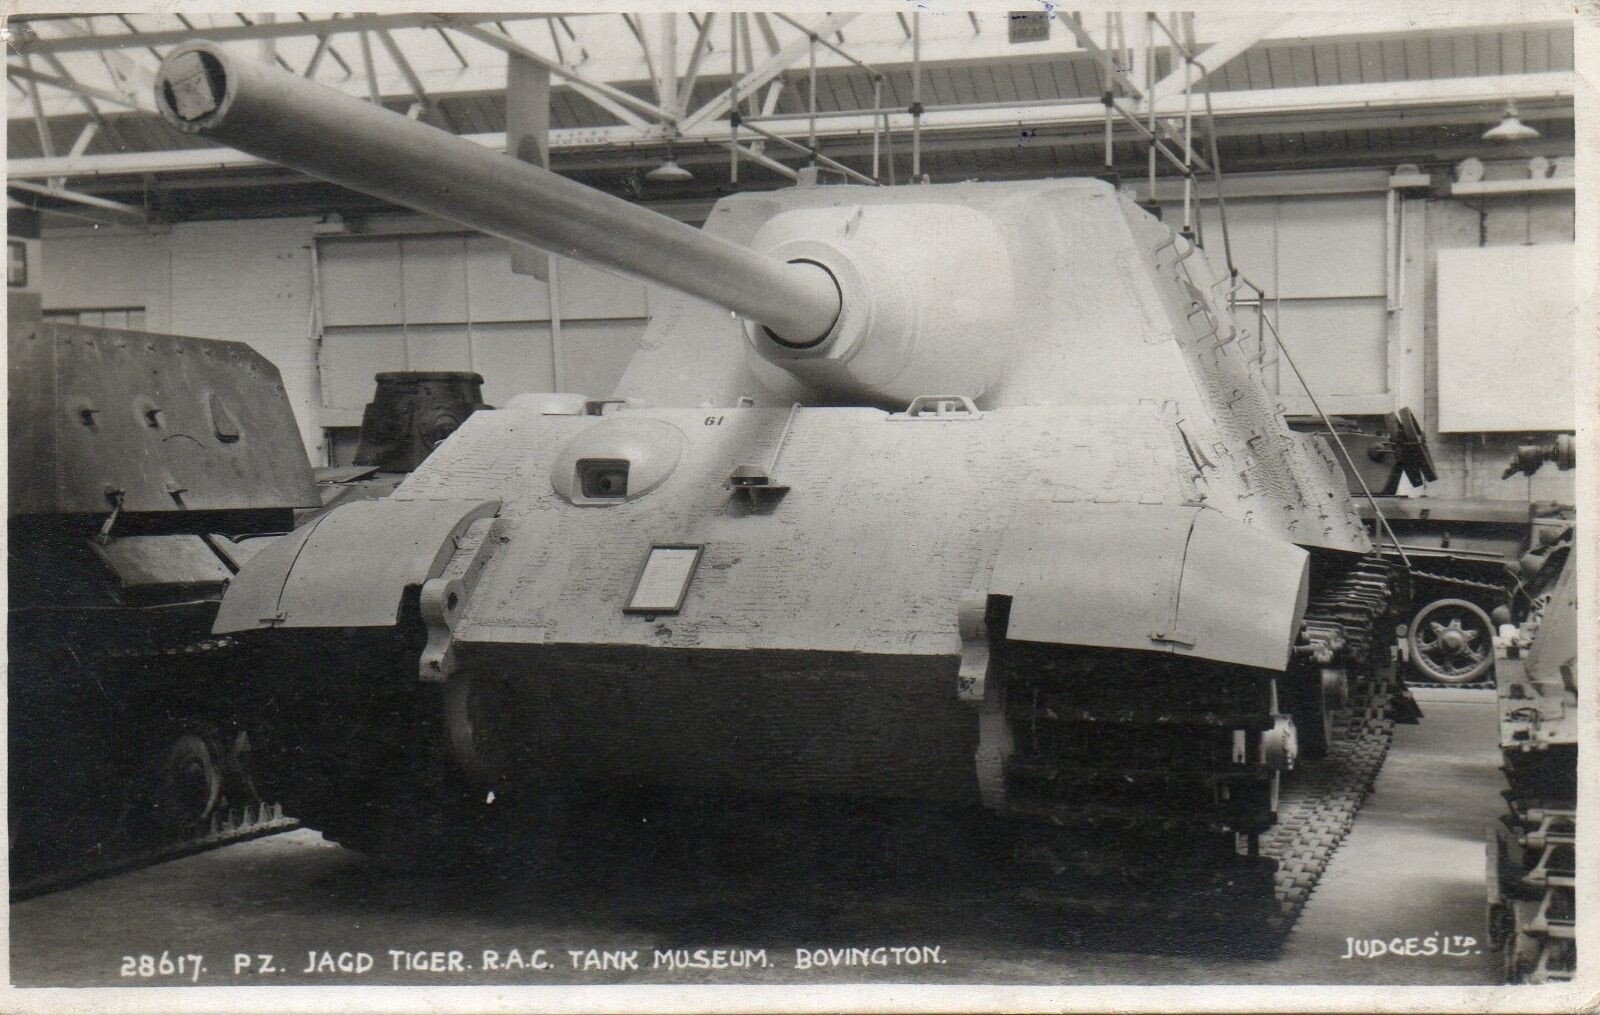 Jagdtiger 305004 with handrails